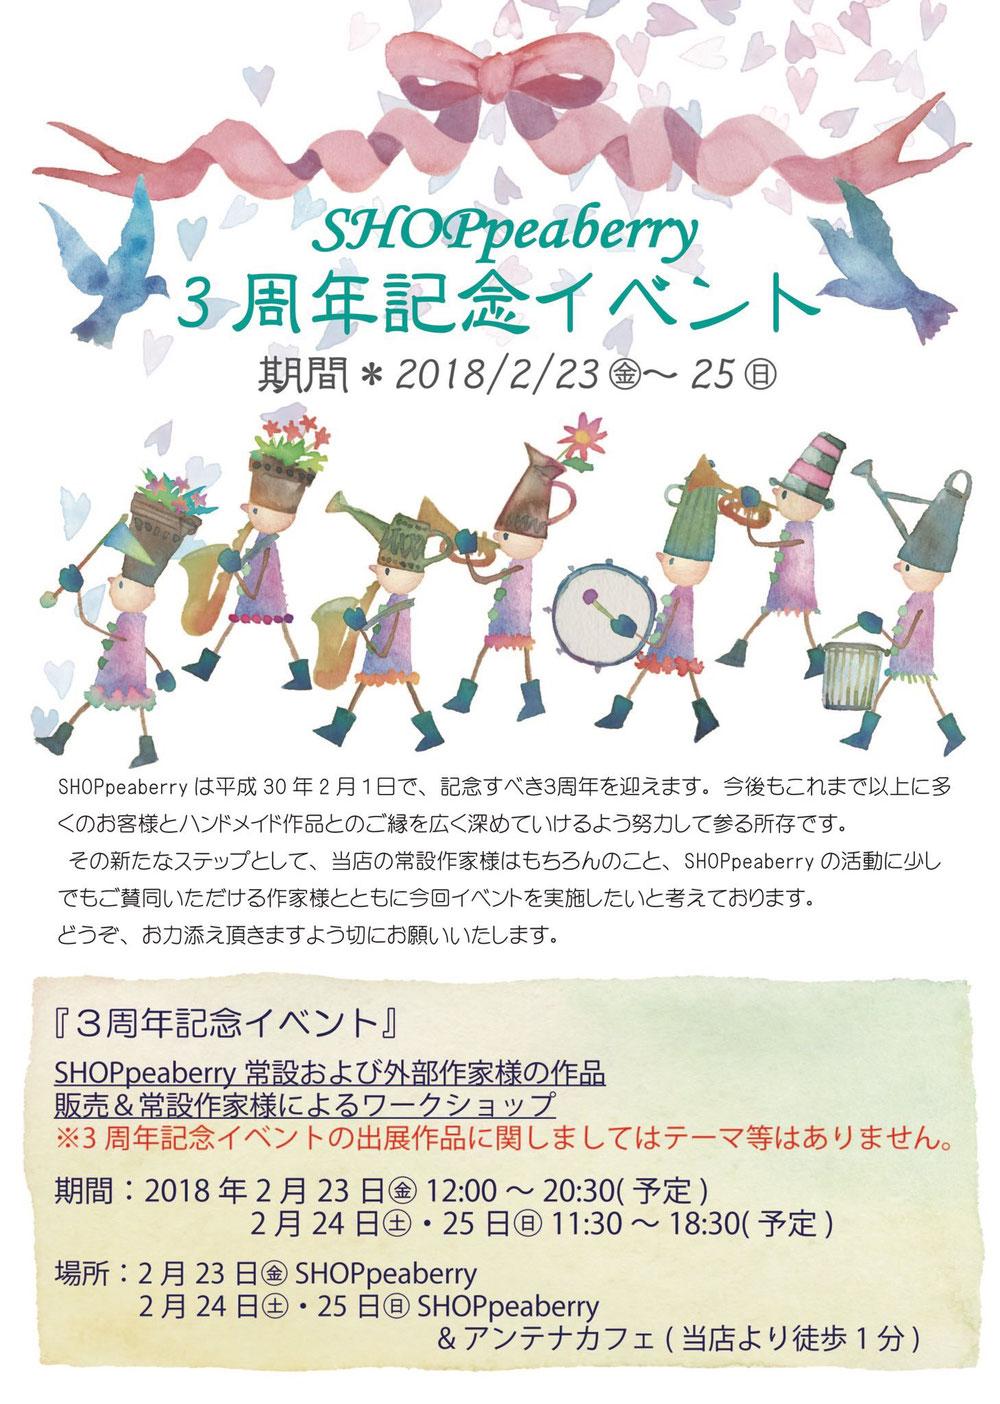 shop peaberry様 3周年記念イベント